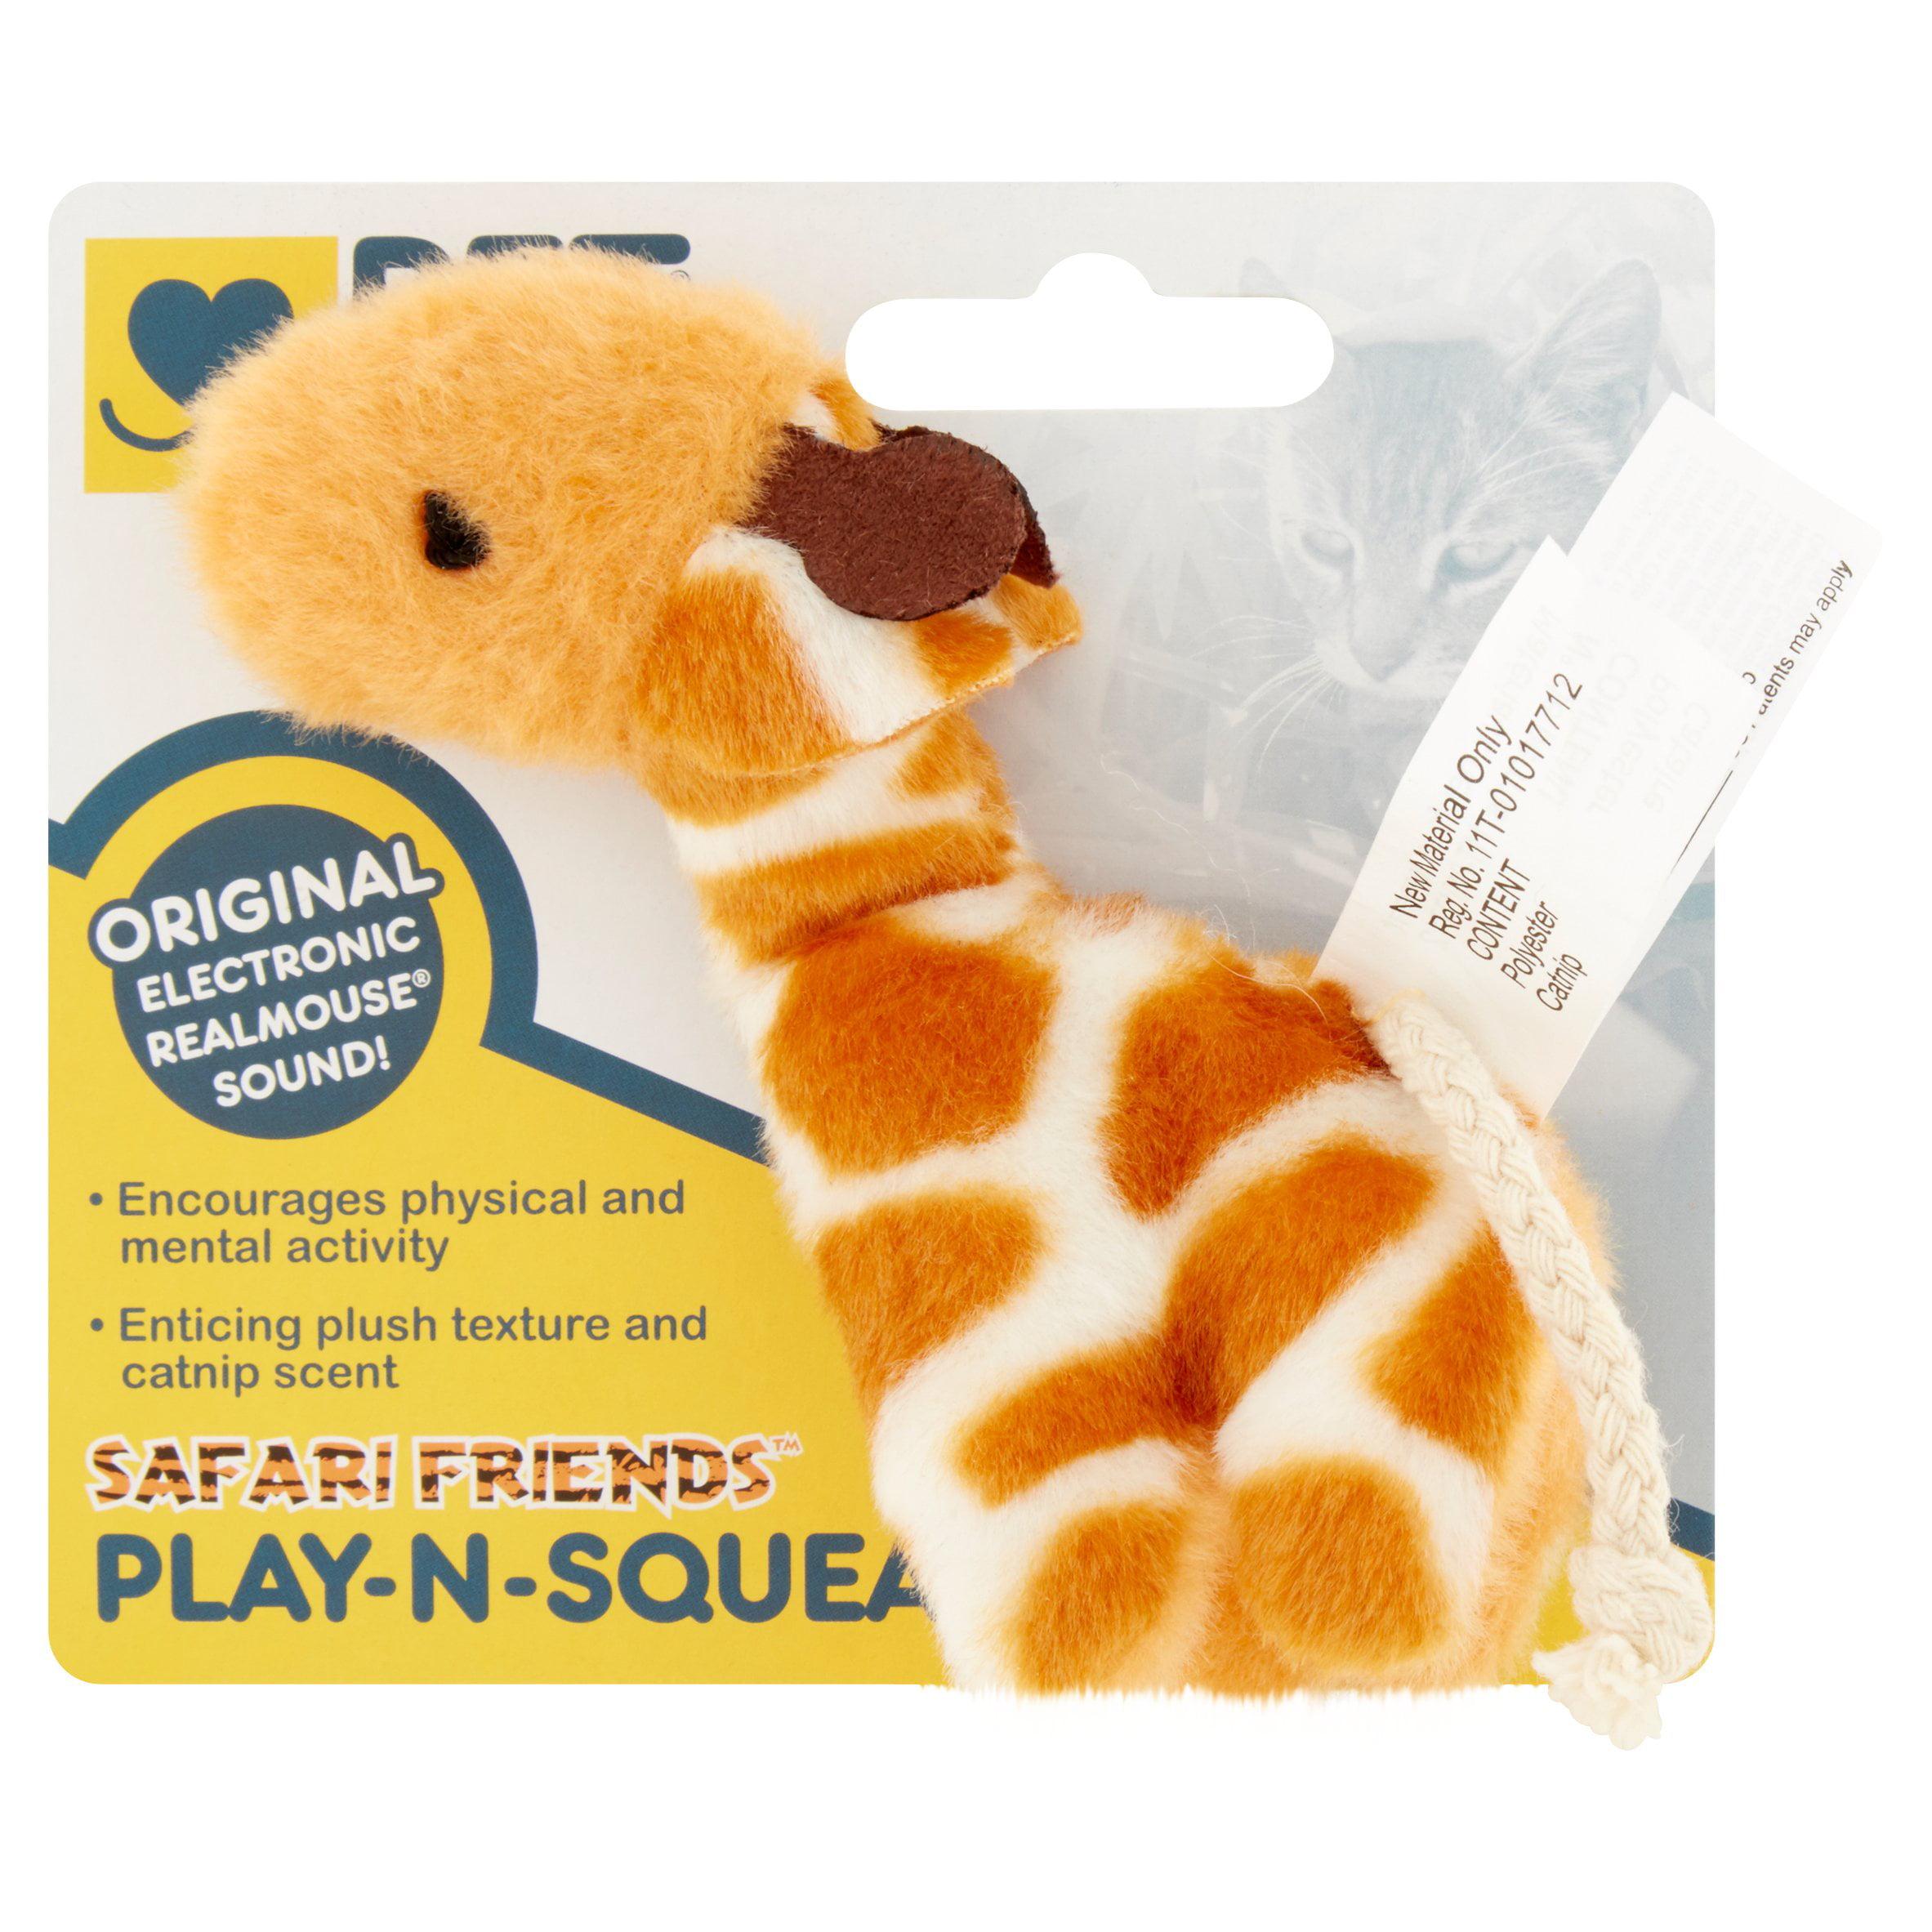 Safari Friends Play-N-Squeak Cat Toy